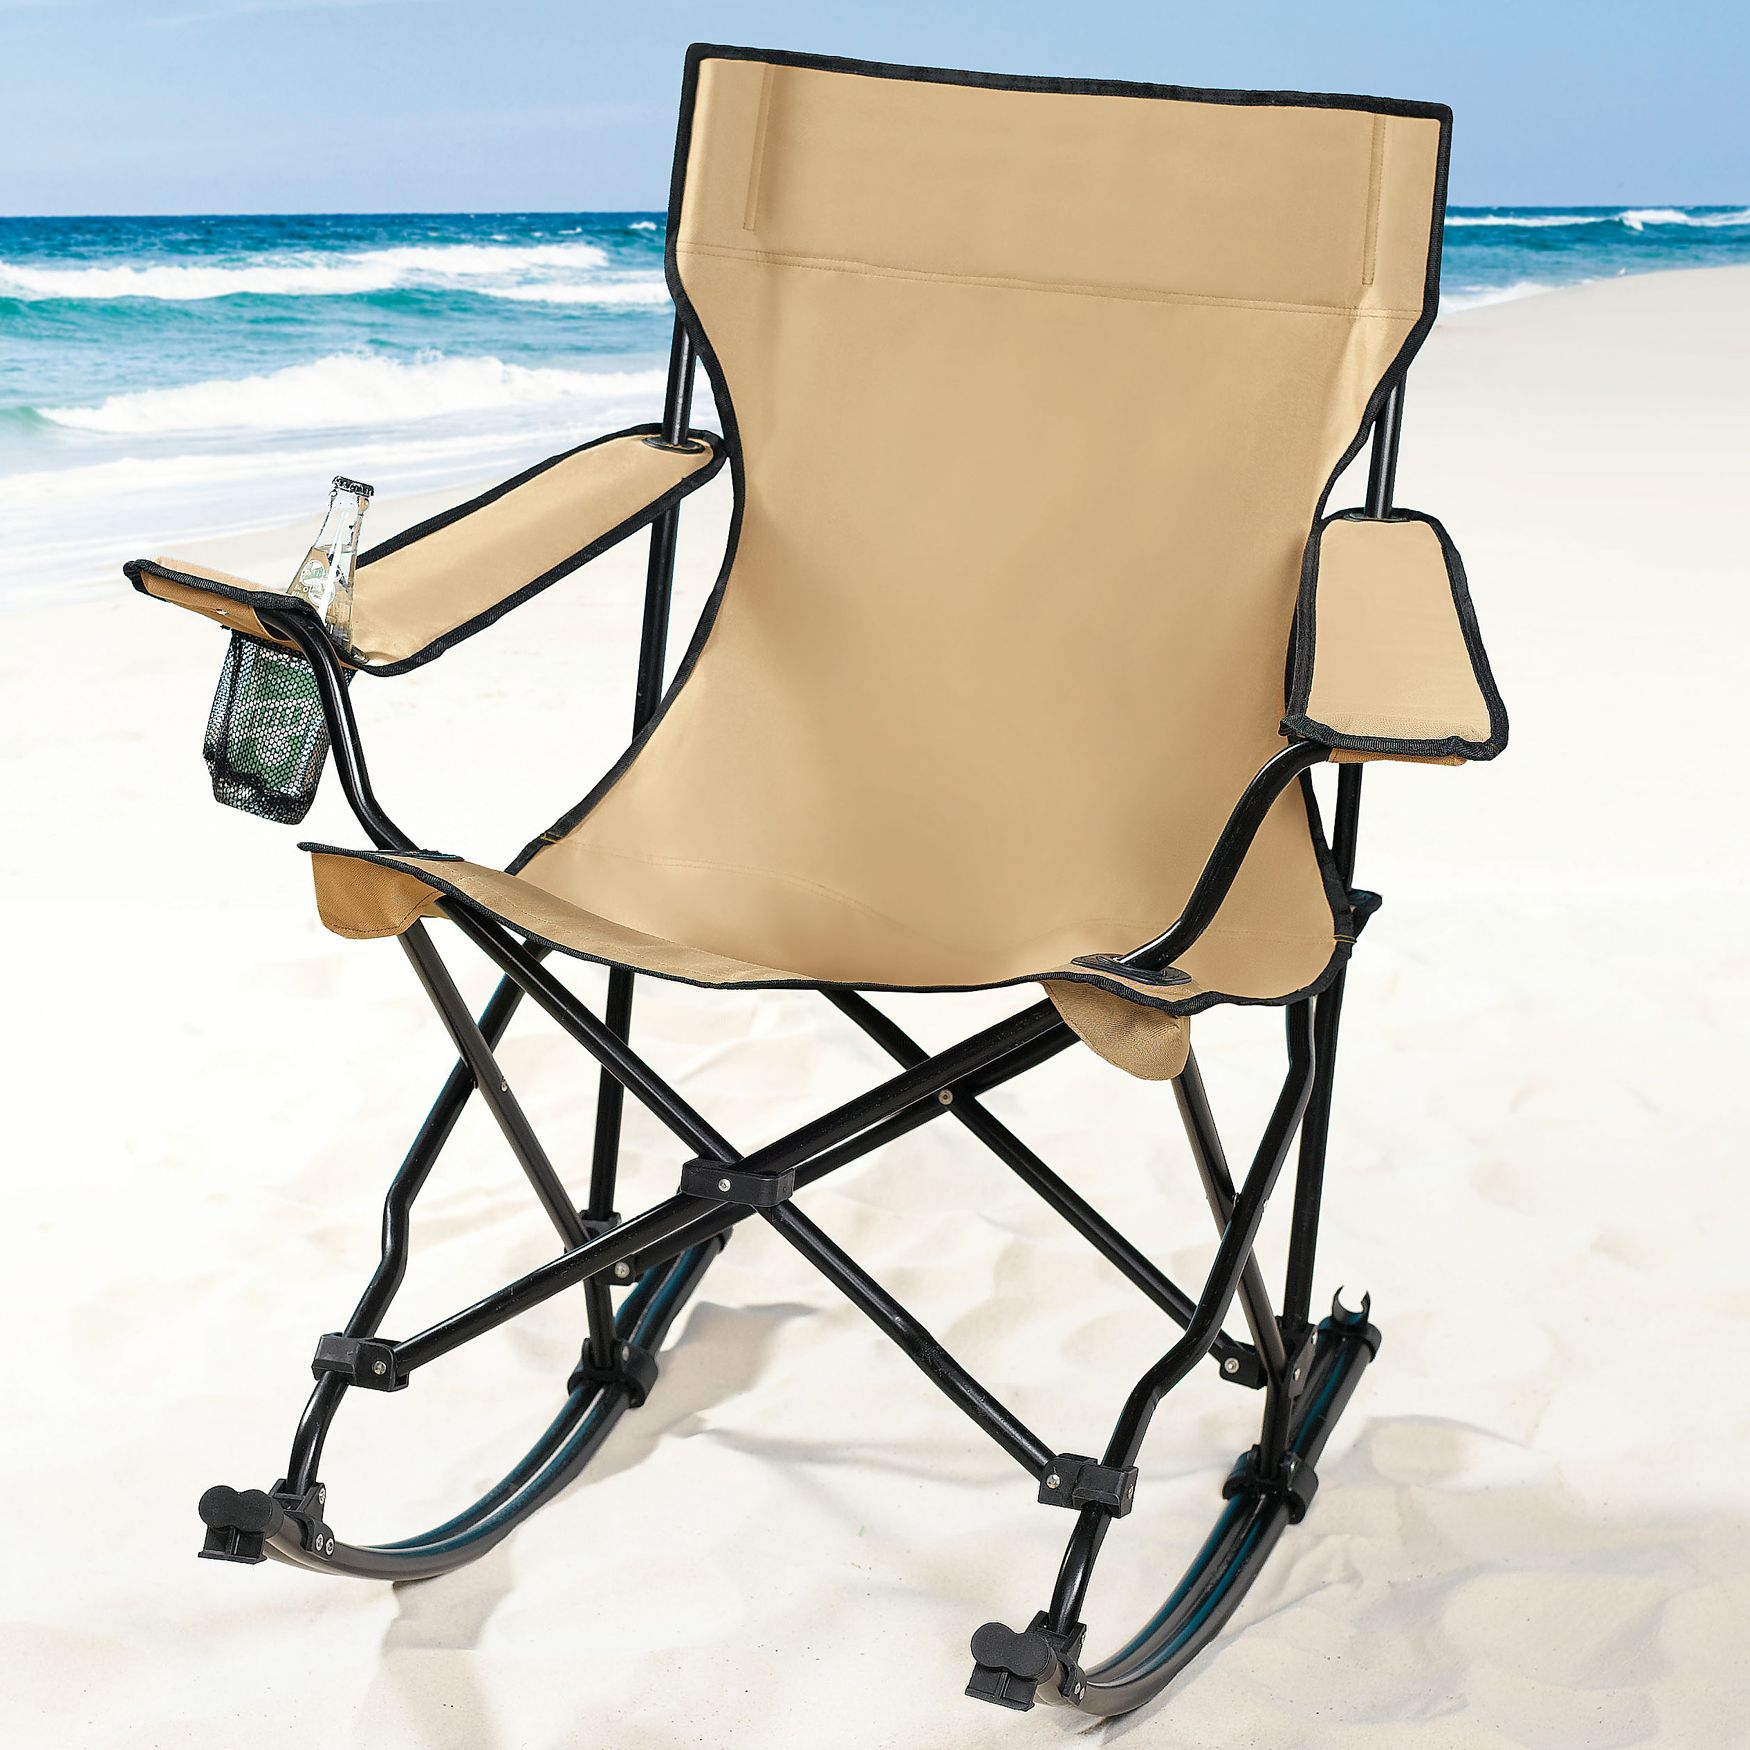 Folding Camp Rocker Rocker chairs, Chair, Rocking chair